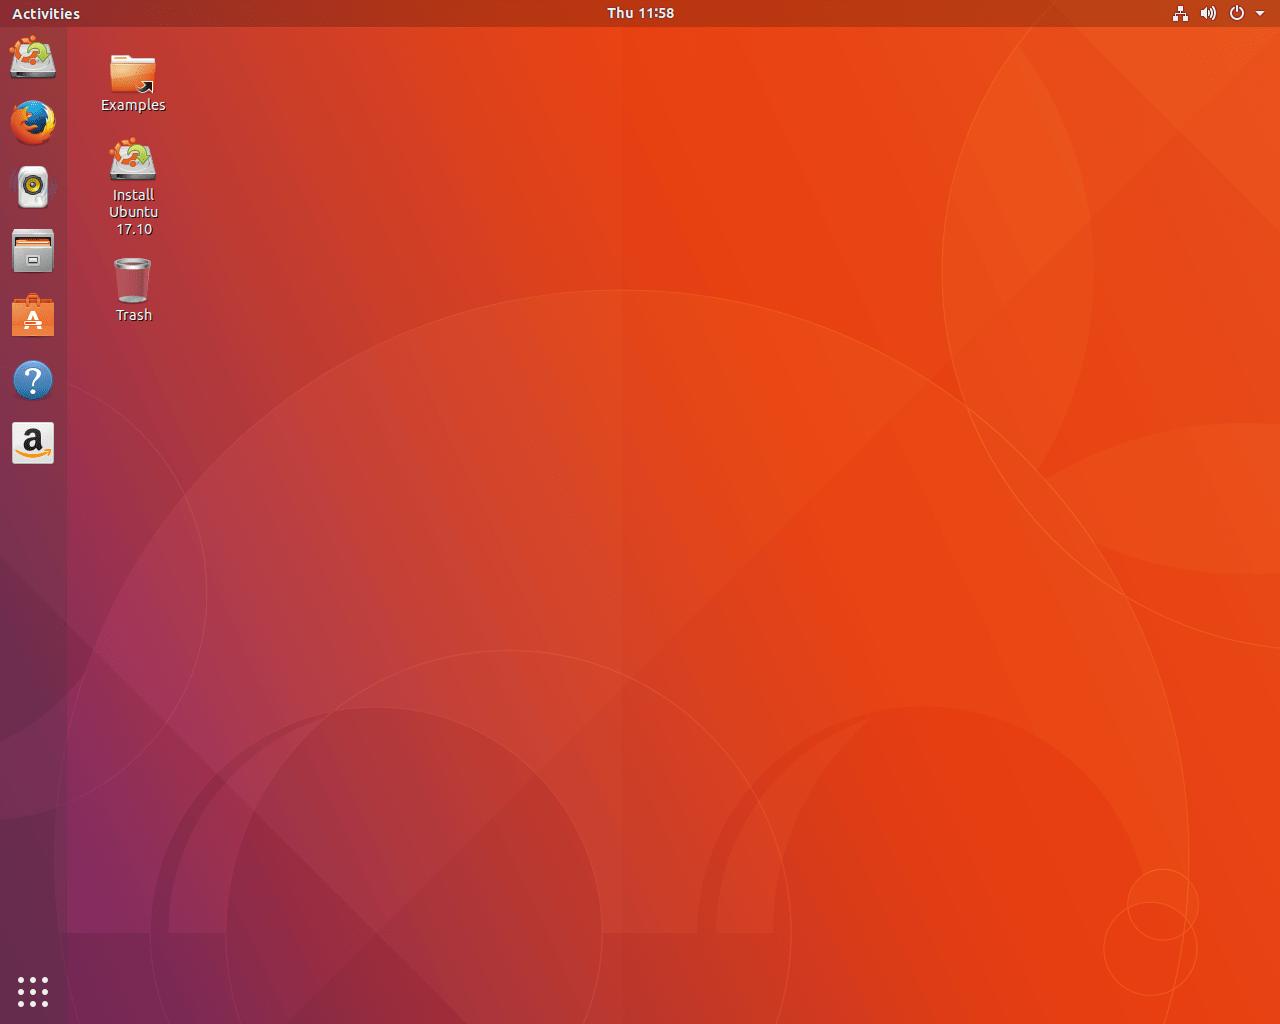 il desktop di ubuntu con il comoo dock a sinistra